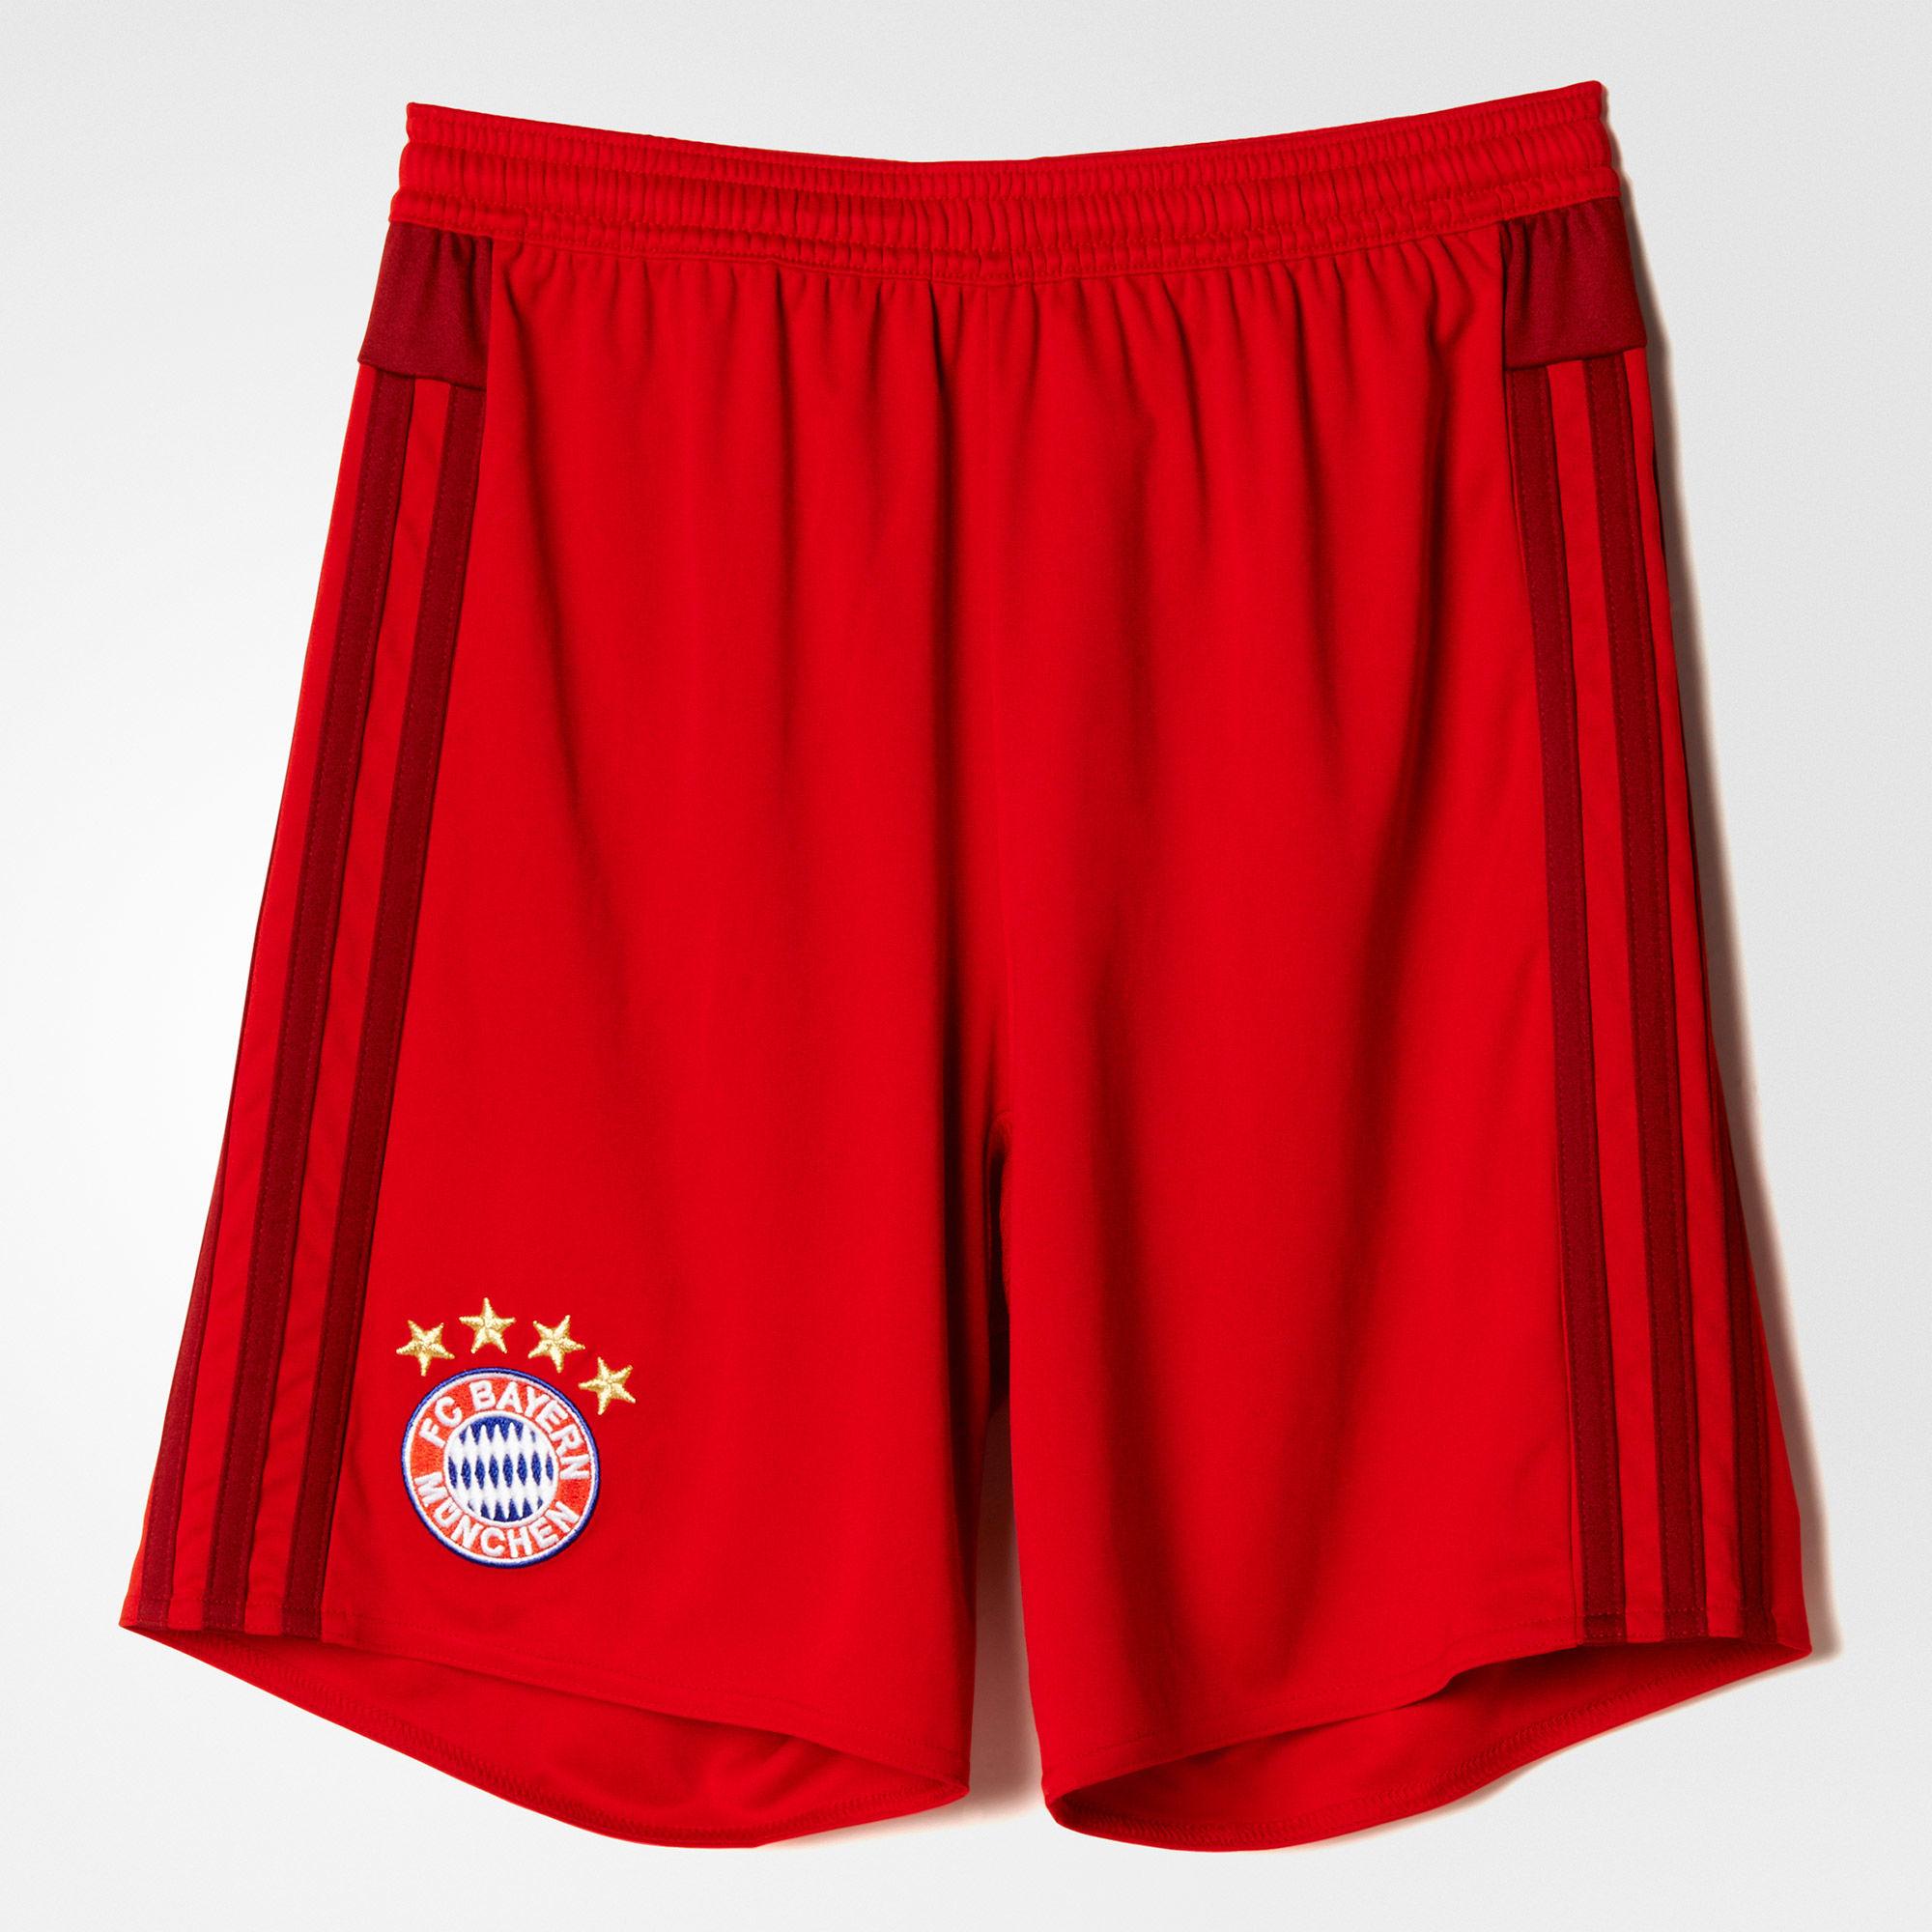 Jungen Heimshorts FC Bayern München Replica Spieler, FCBTRU/CRARED, 176